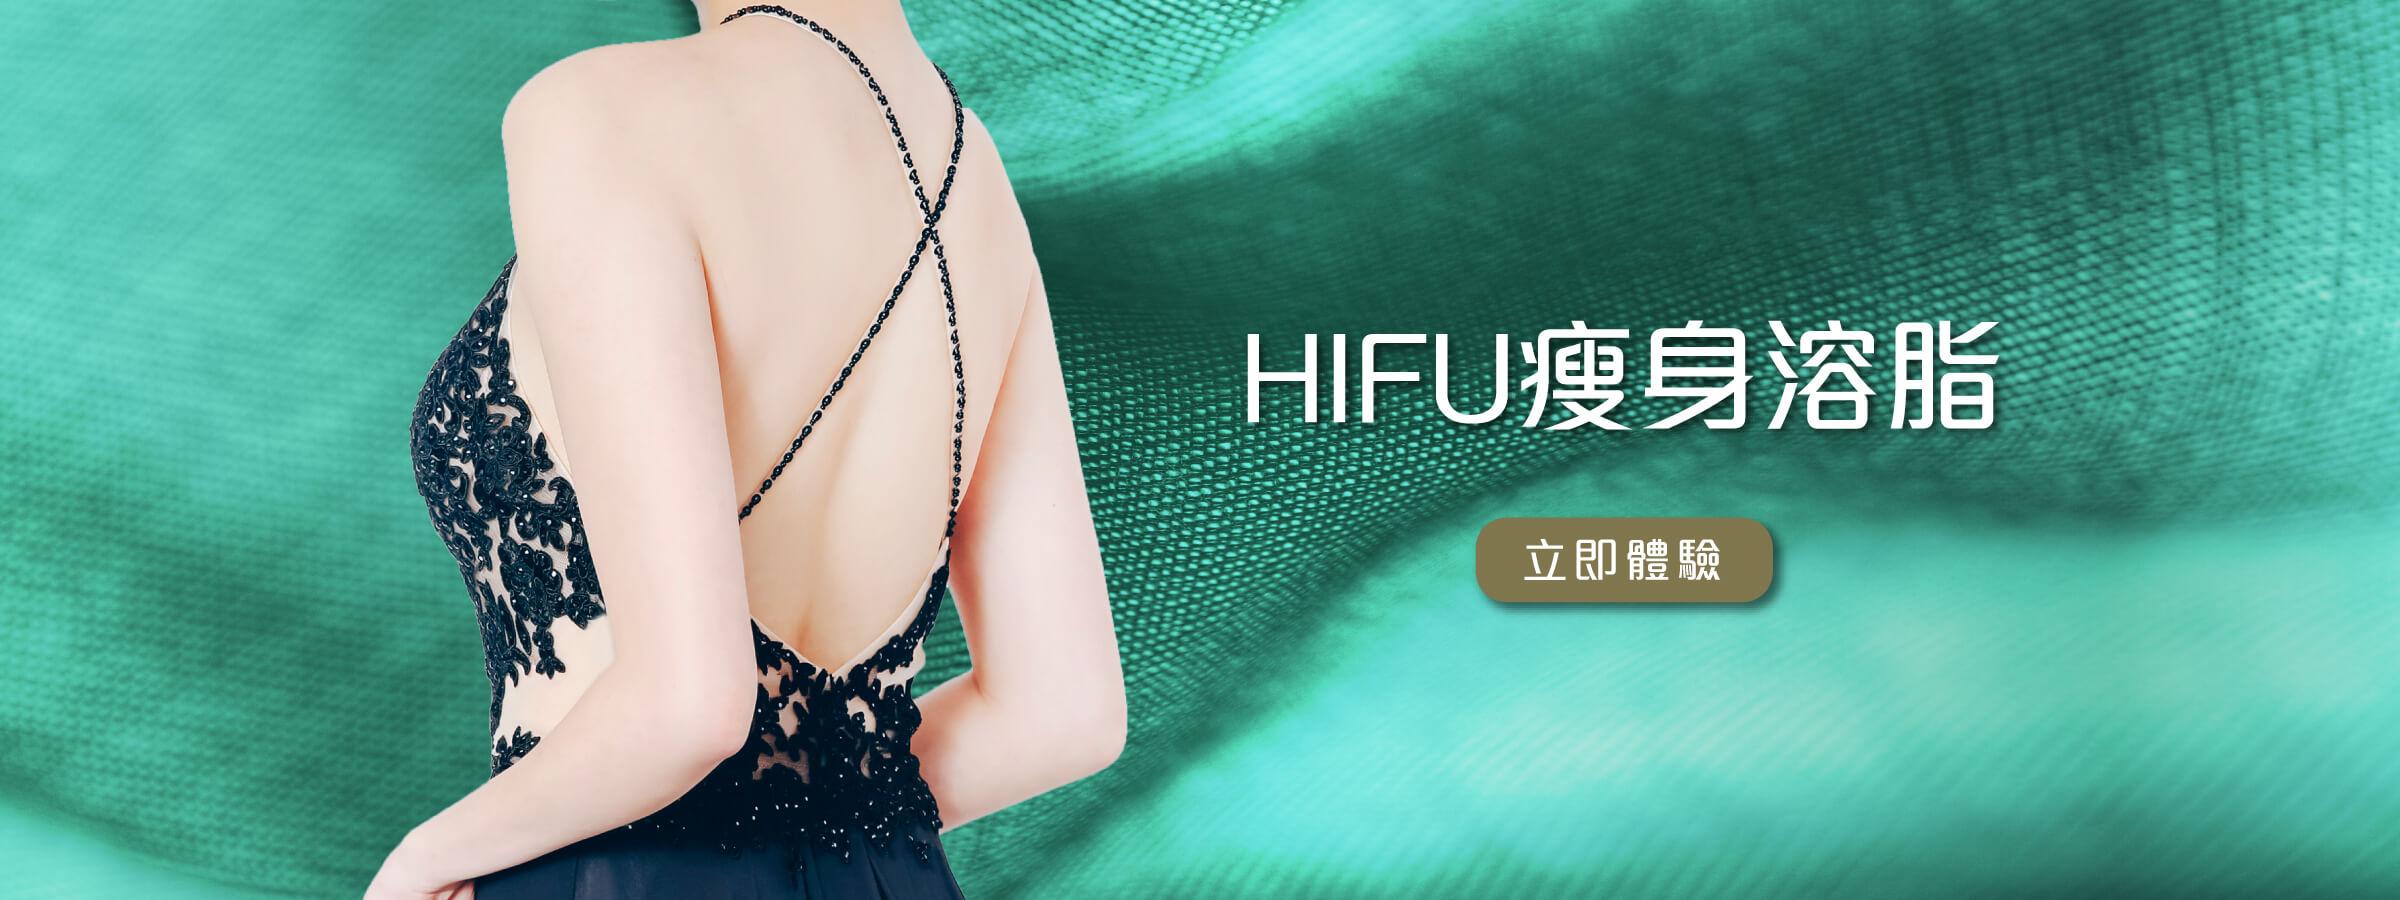 hifu減肥